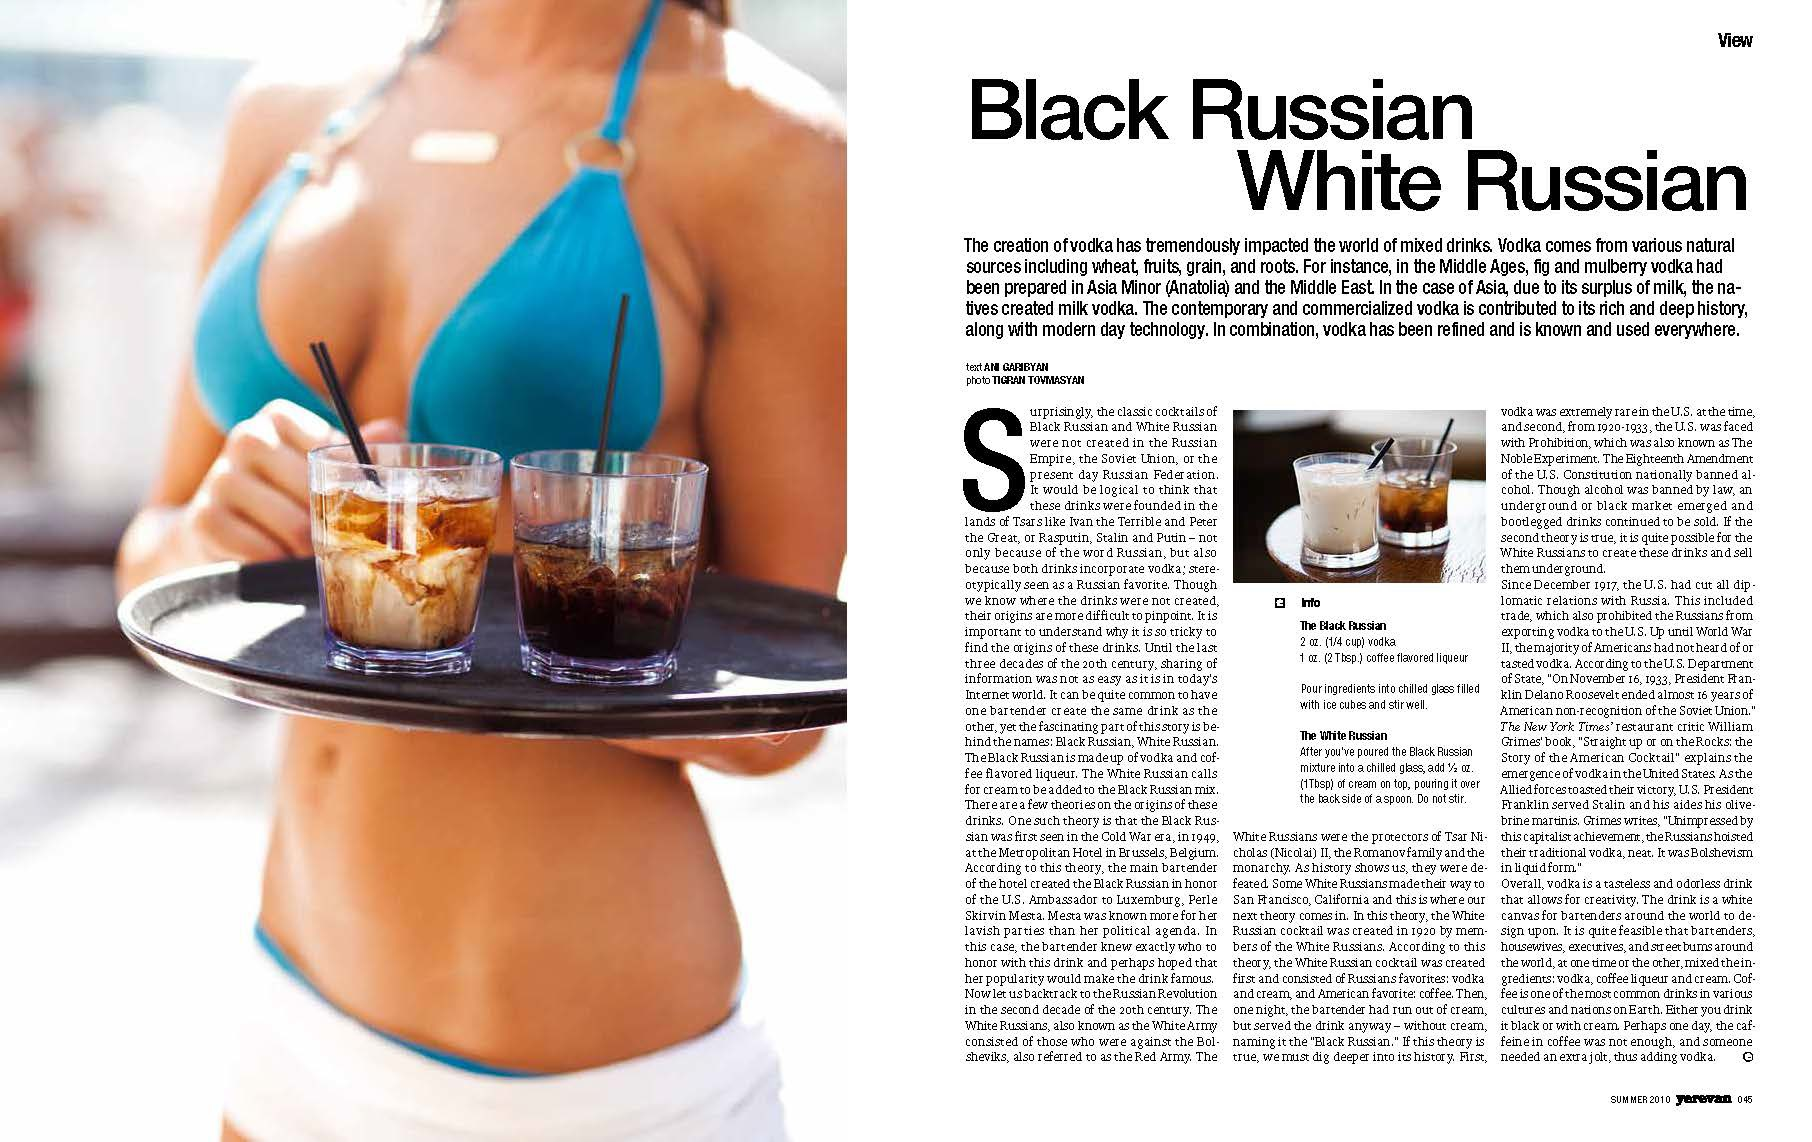 BlackRussian.jpg